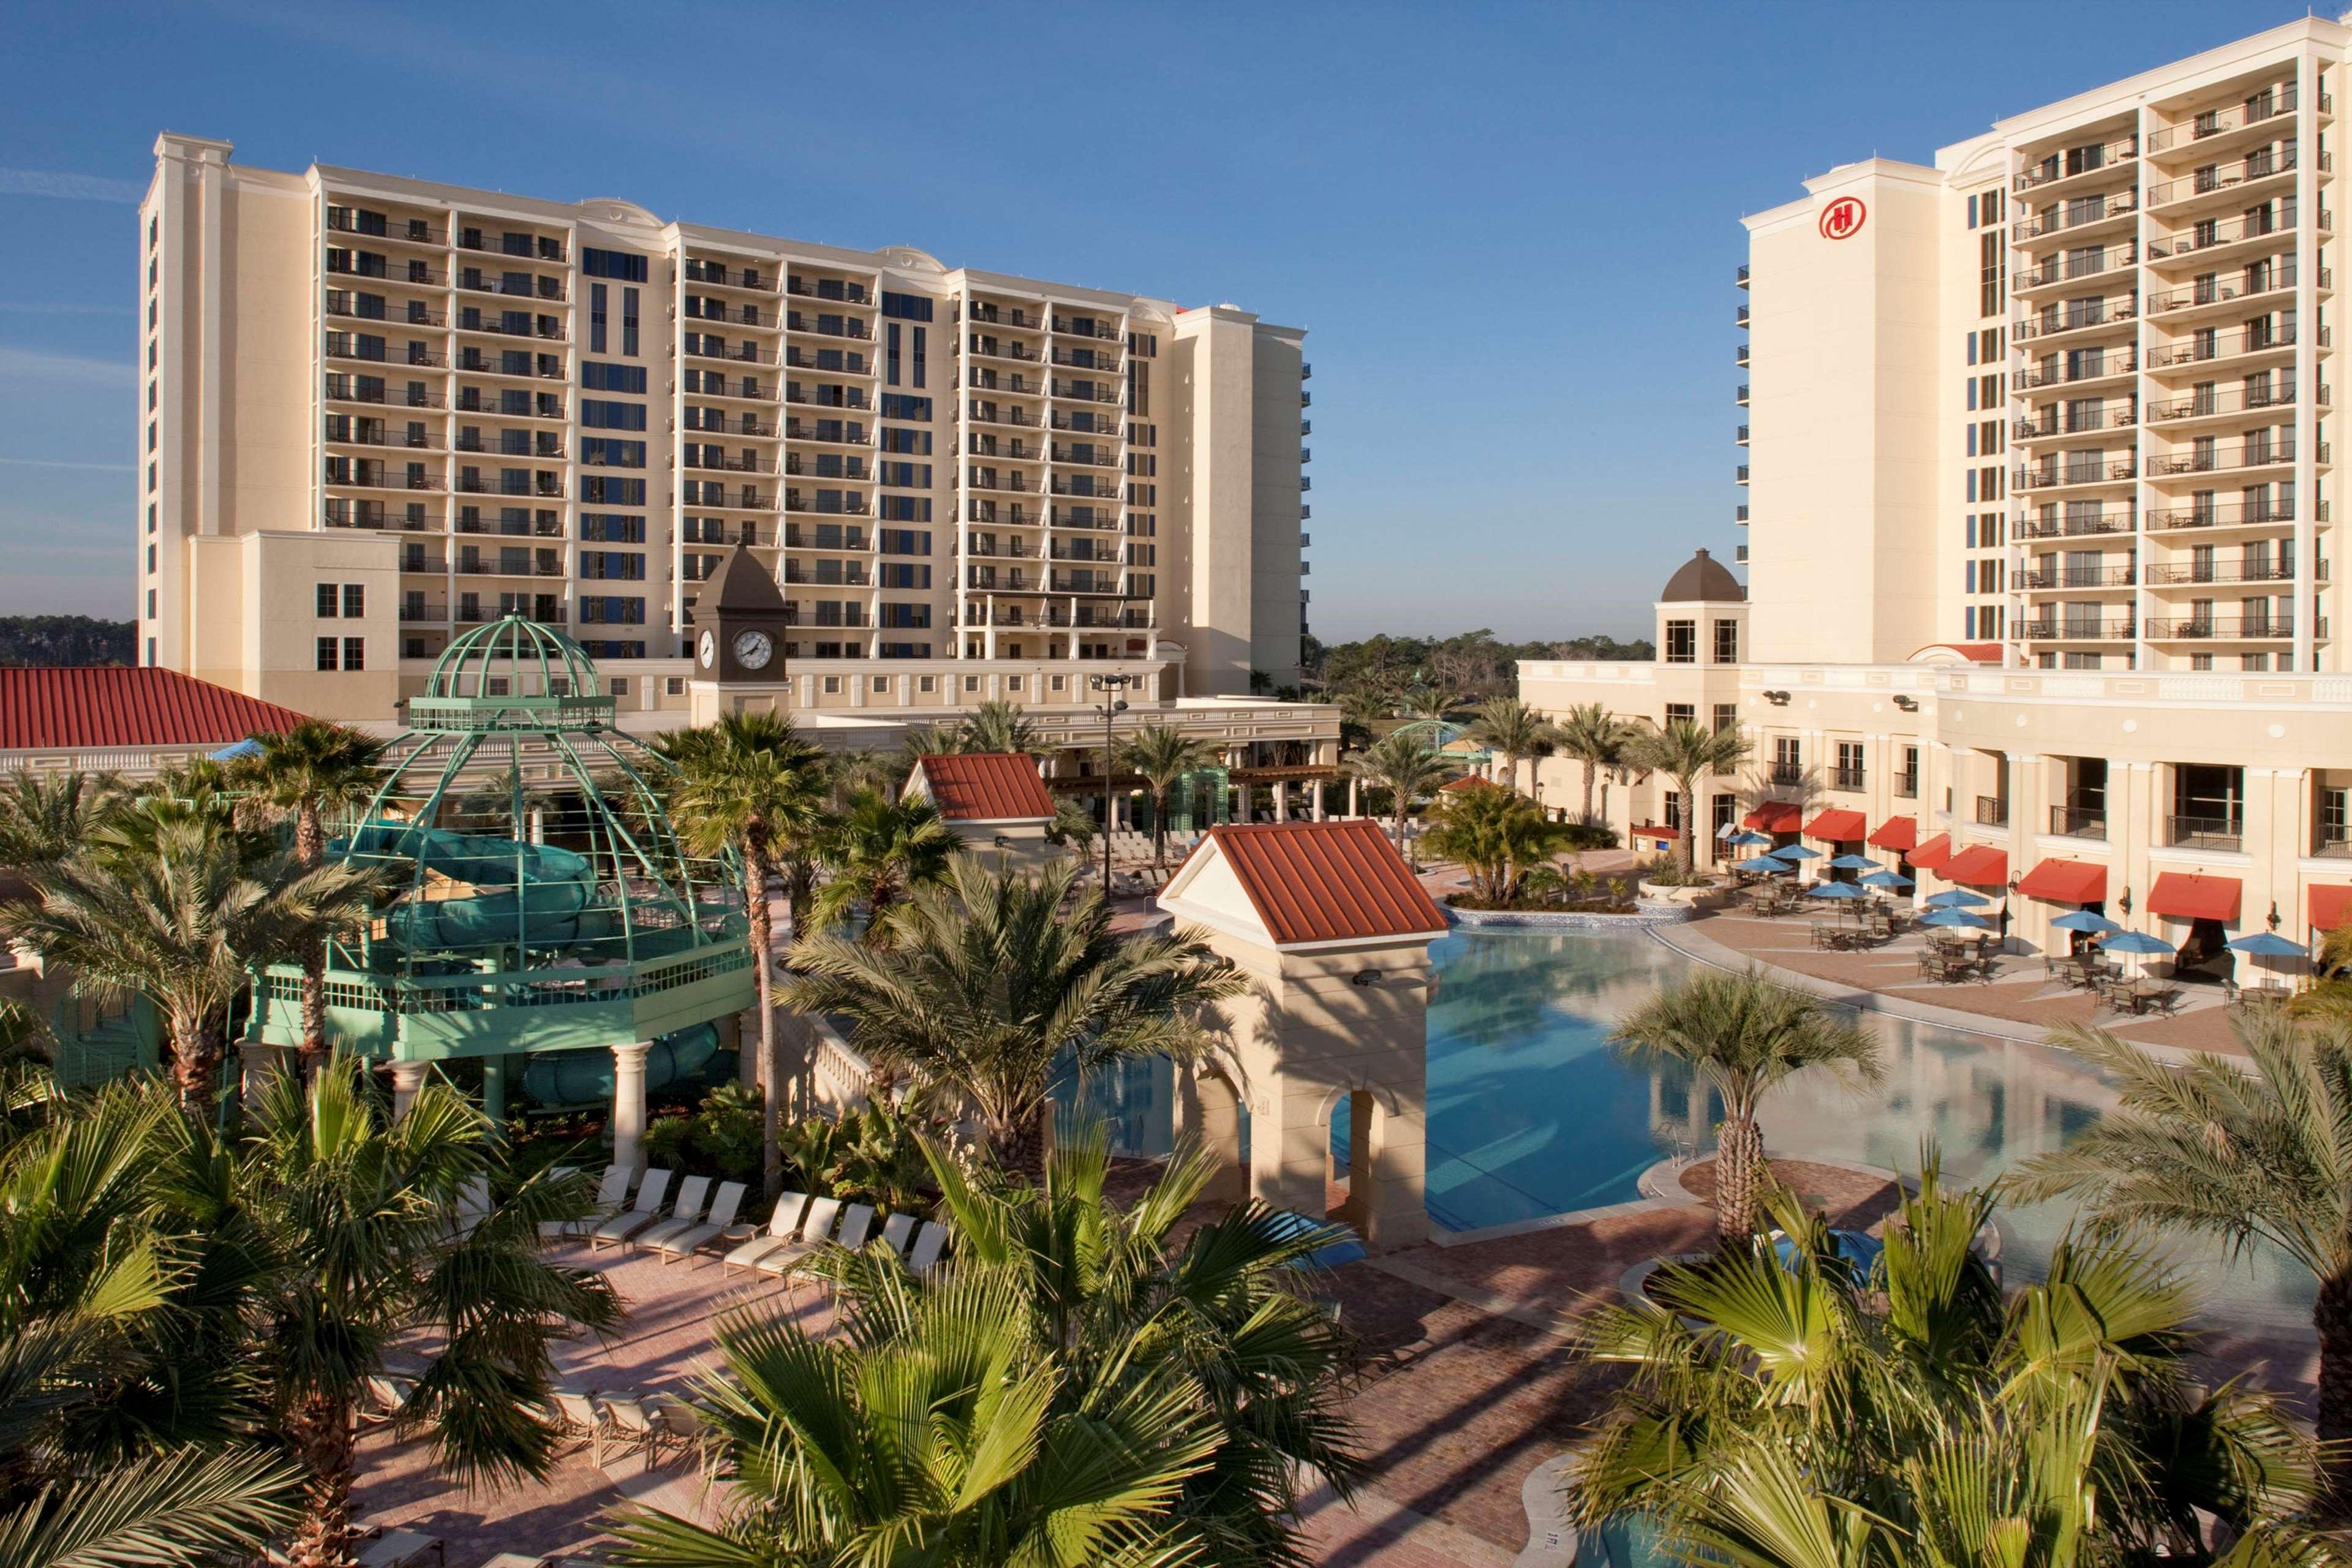 Parc Soleil by Hilton Grand Vacations  11272 Desforges